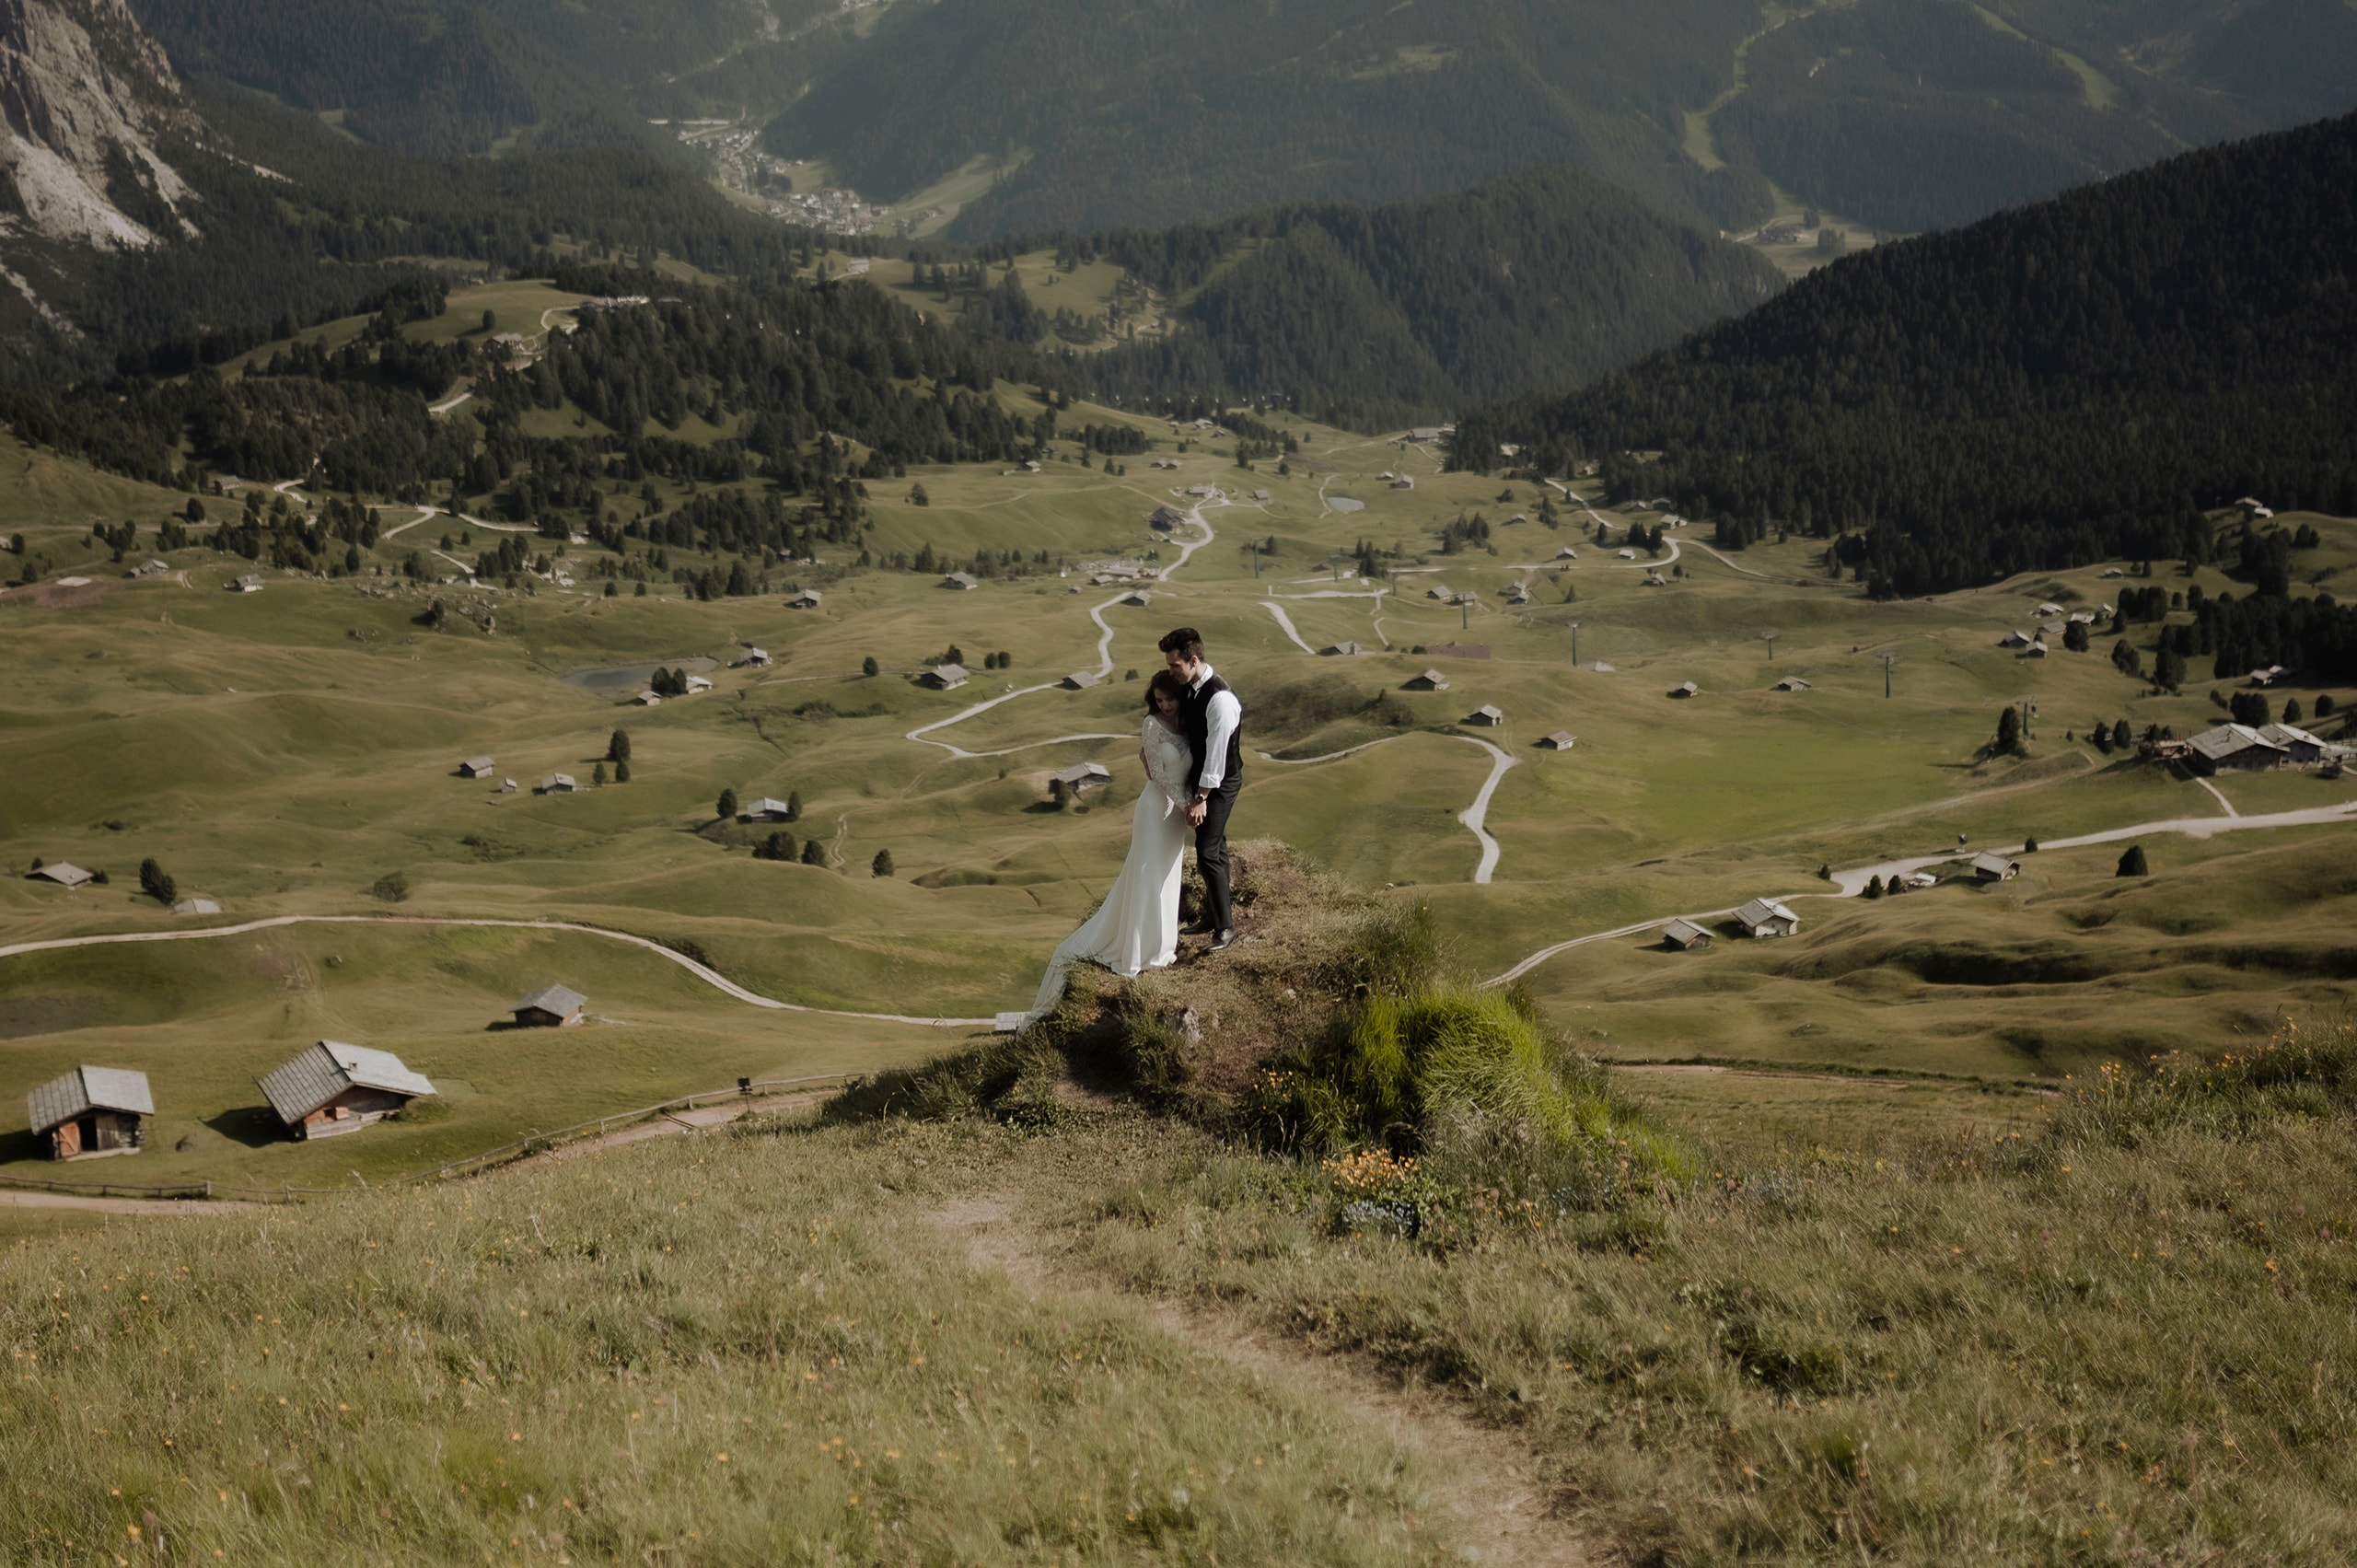 Groom hugging bride at Seceda Dolomites Elopement in Italy